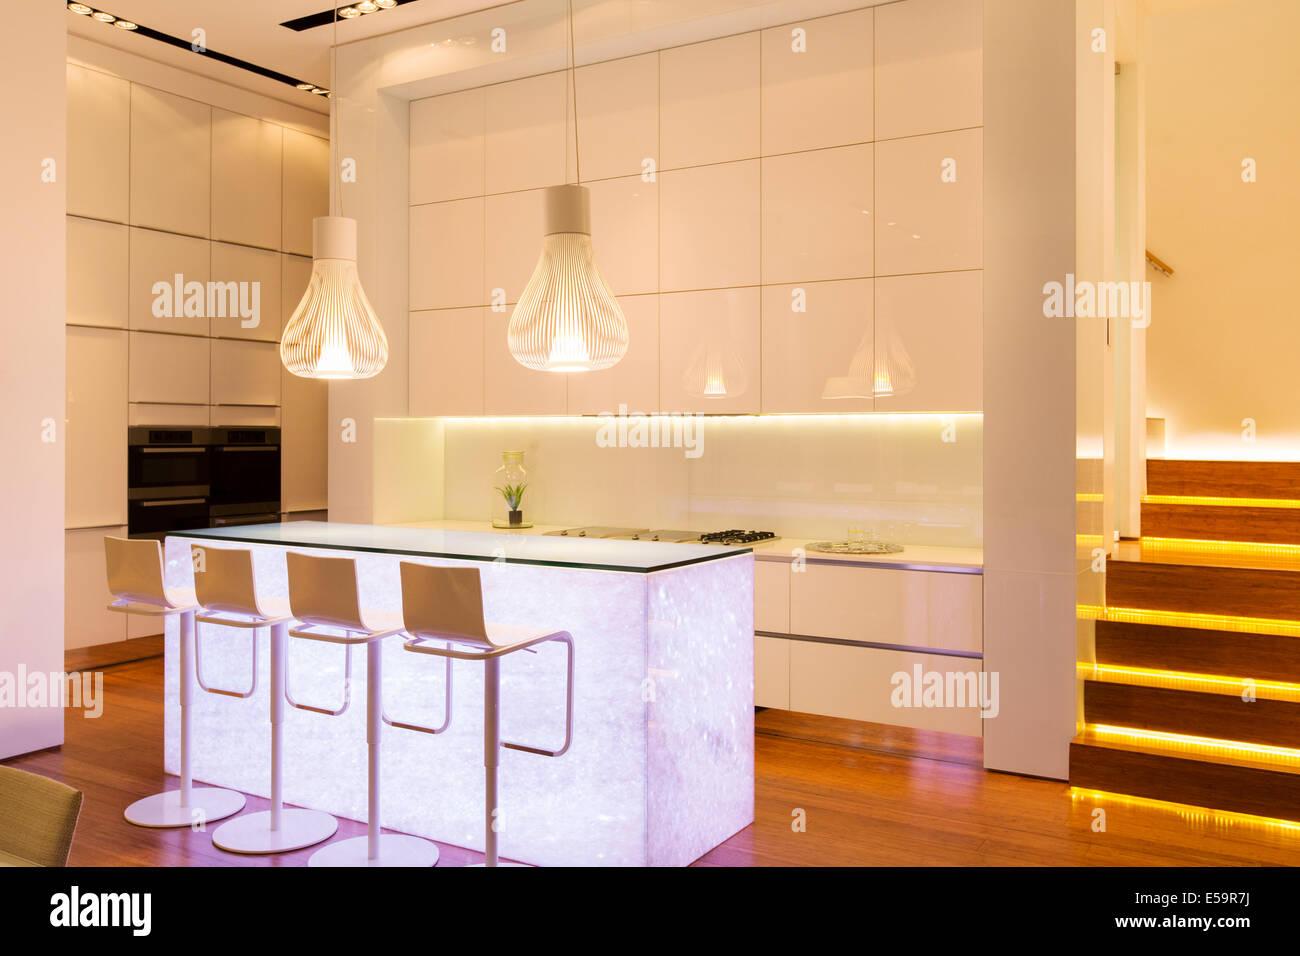 Sgabelli da bar e illuminazione nella cucina moderna foto